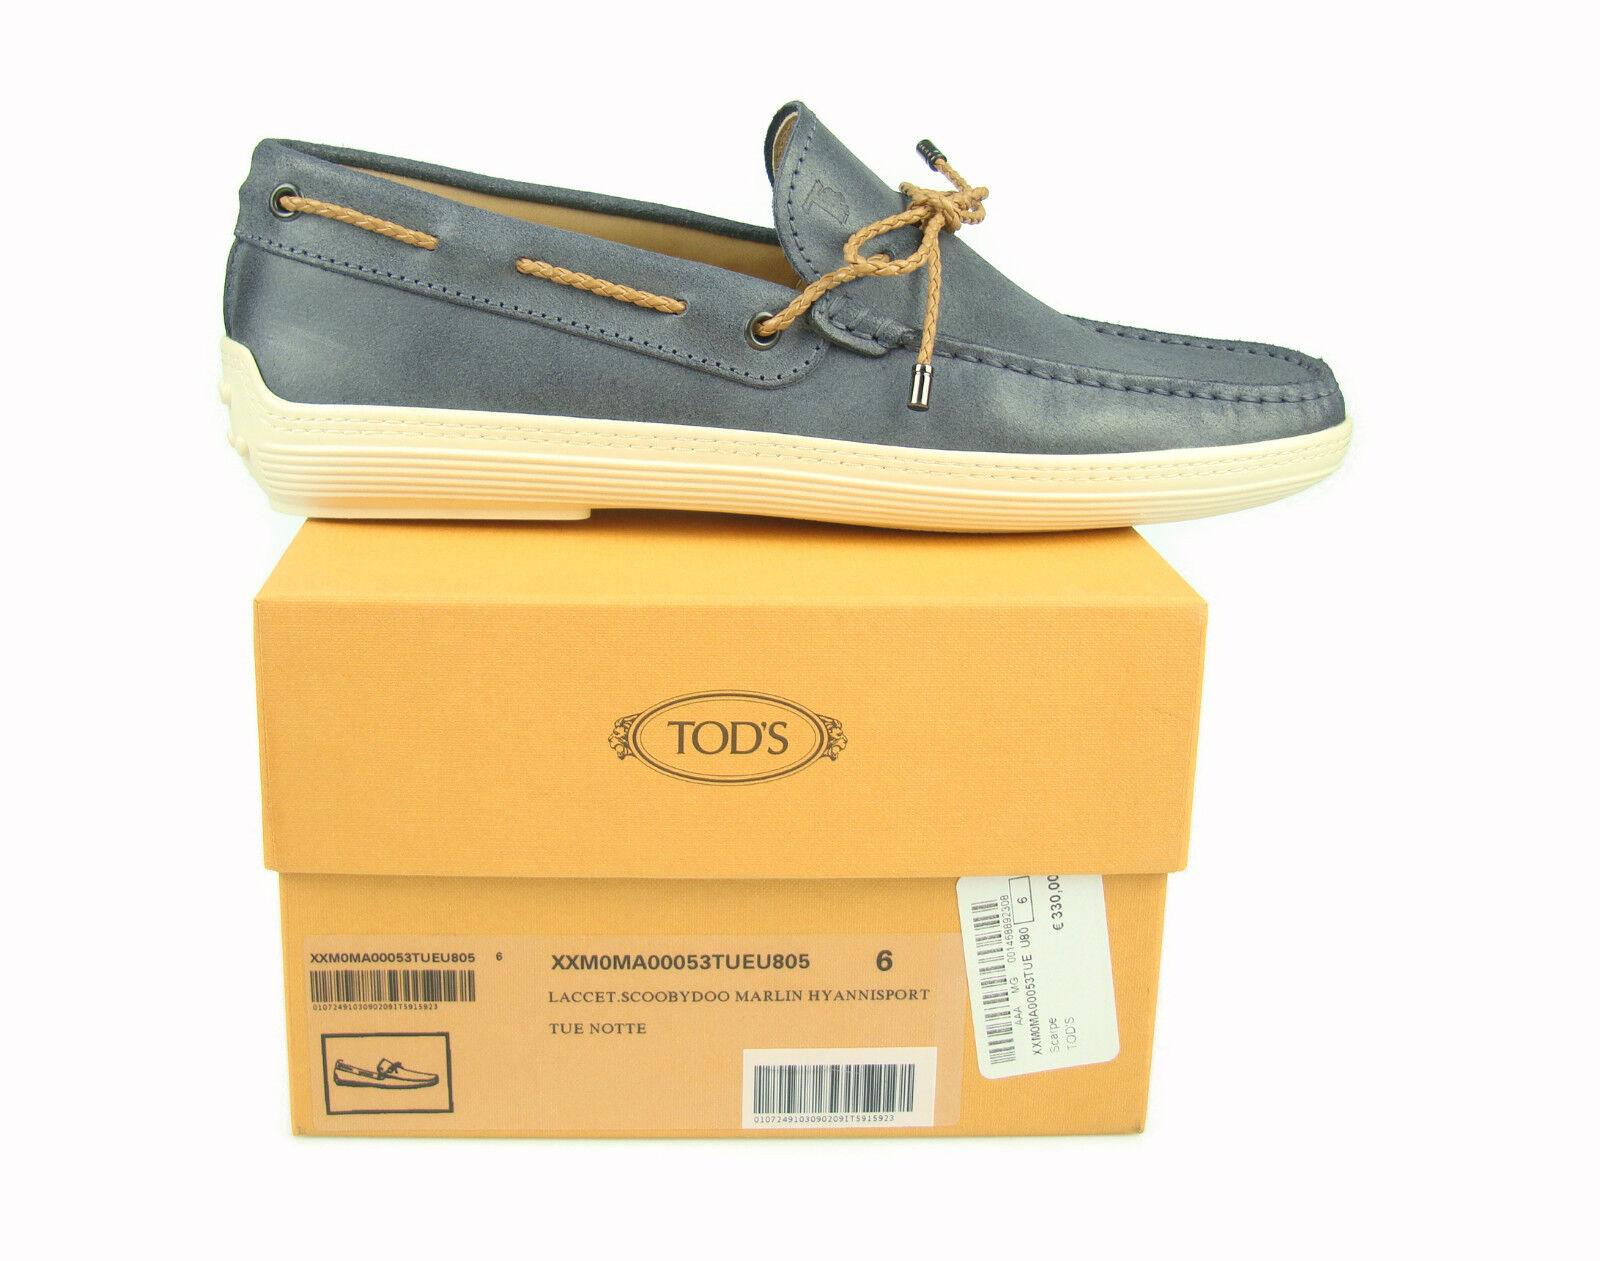 Tod's mokassin BOOT herren Schuhe halbschuhe loafers herrenschuhe man halbschuhe Schuhe d2af74